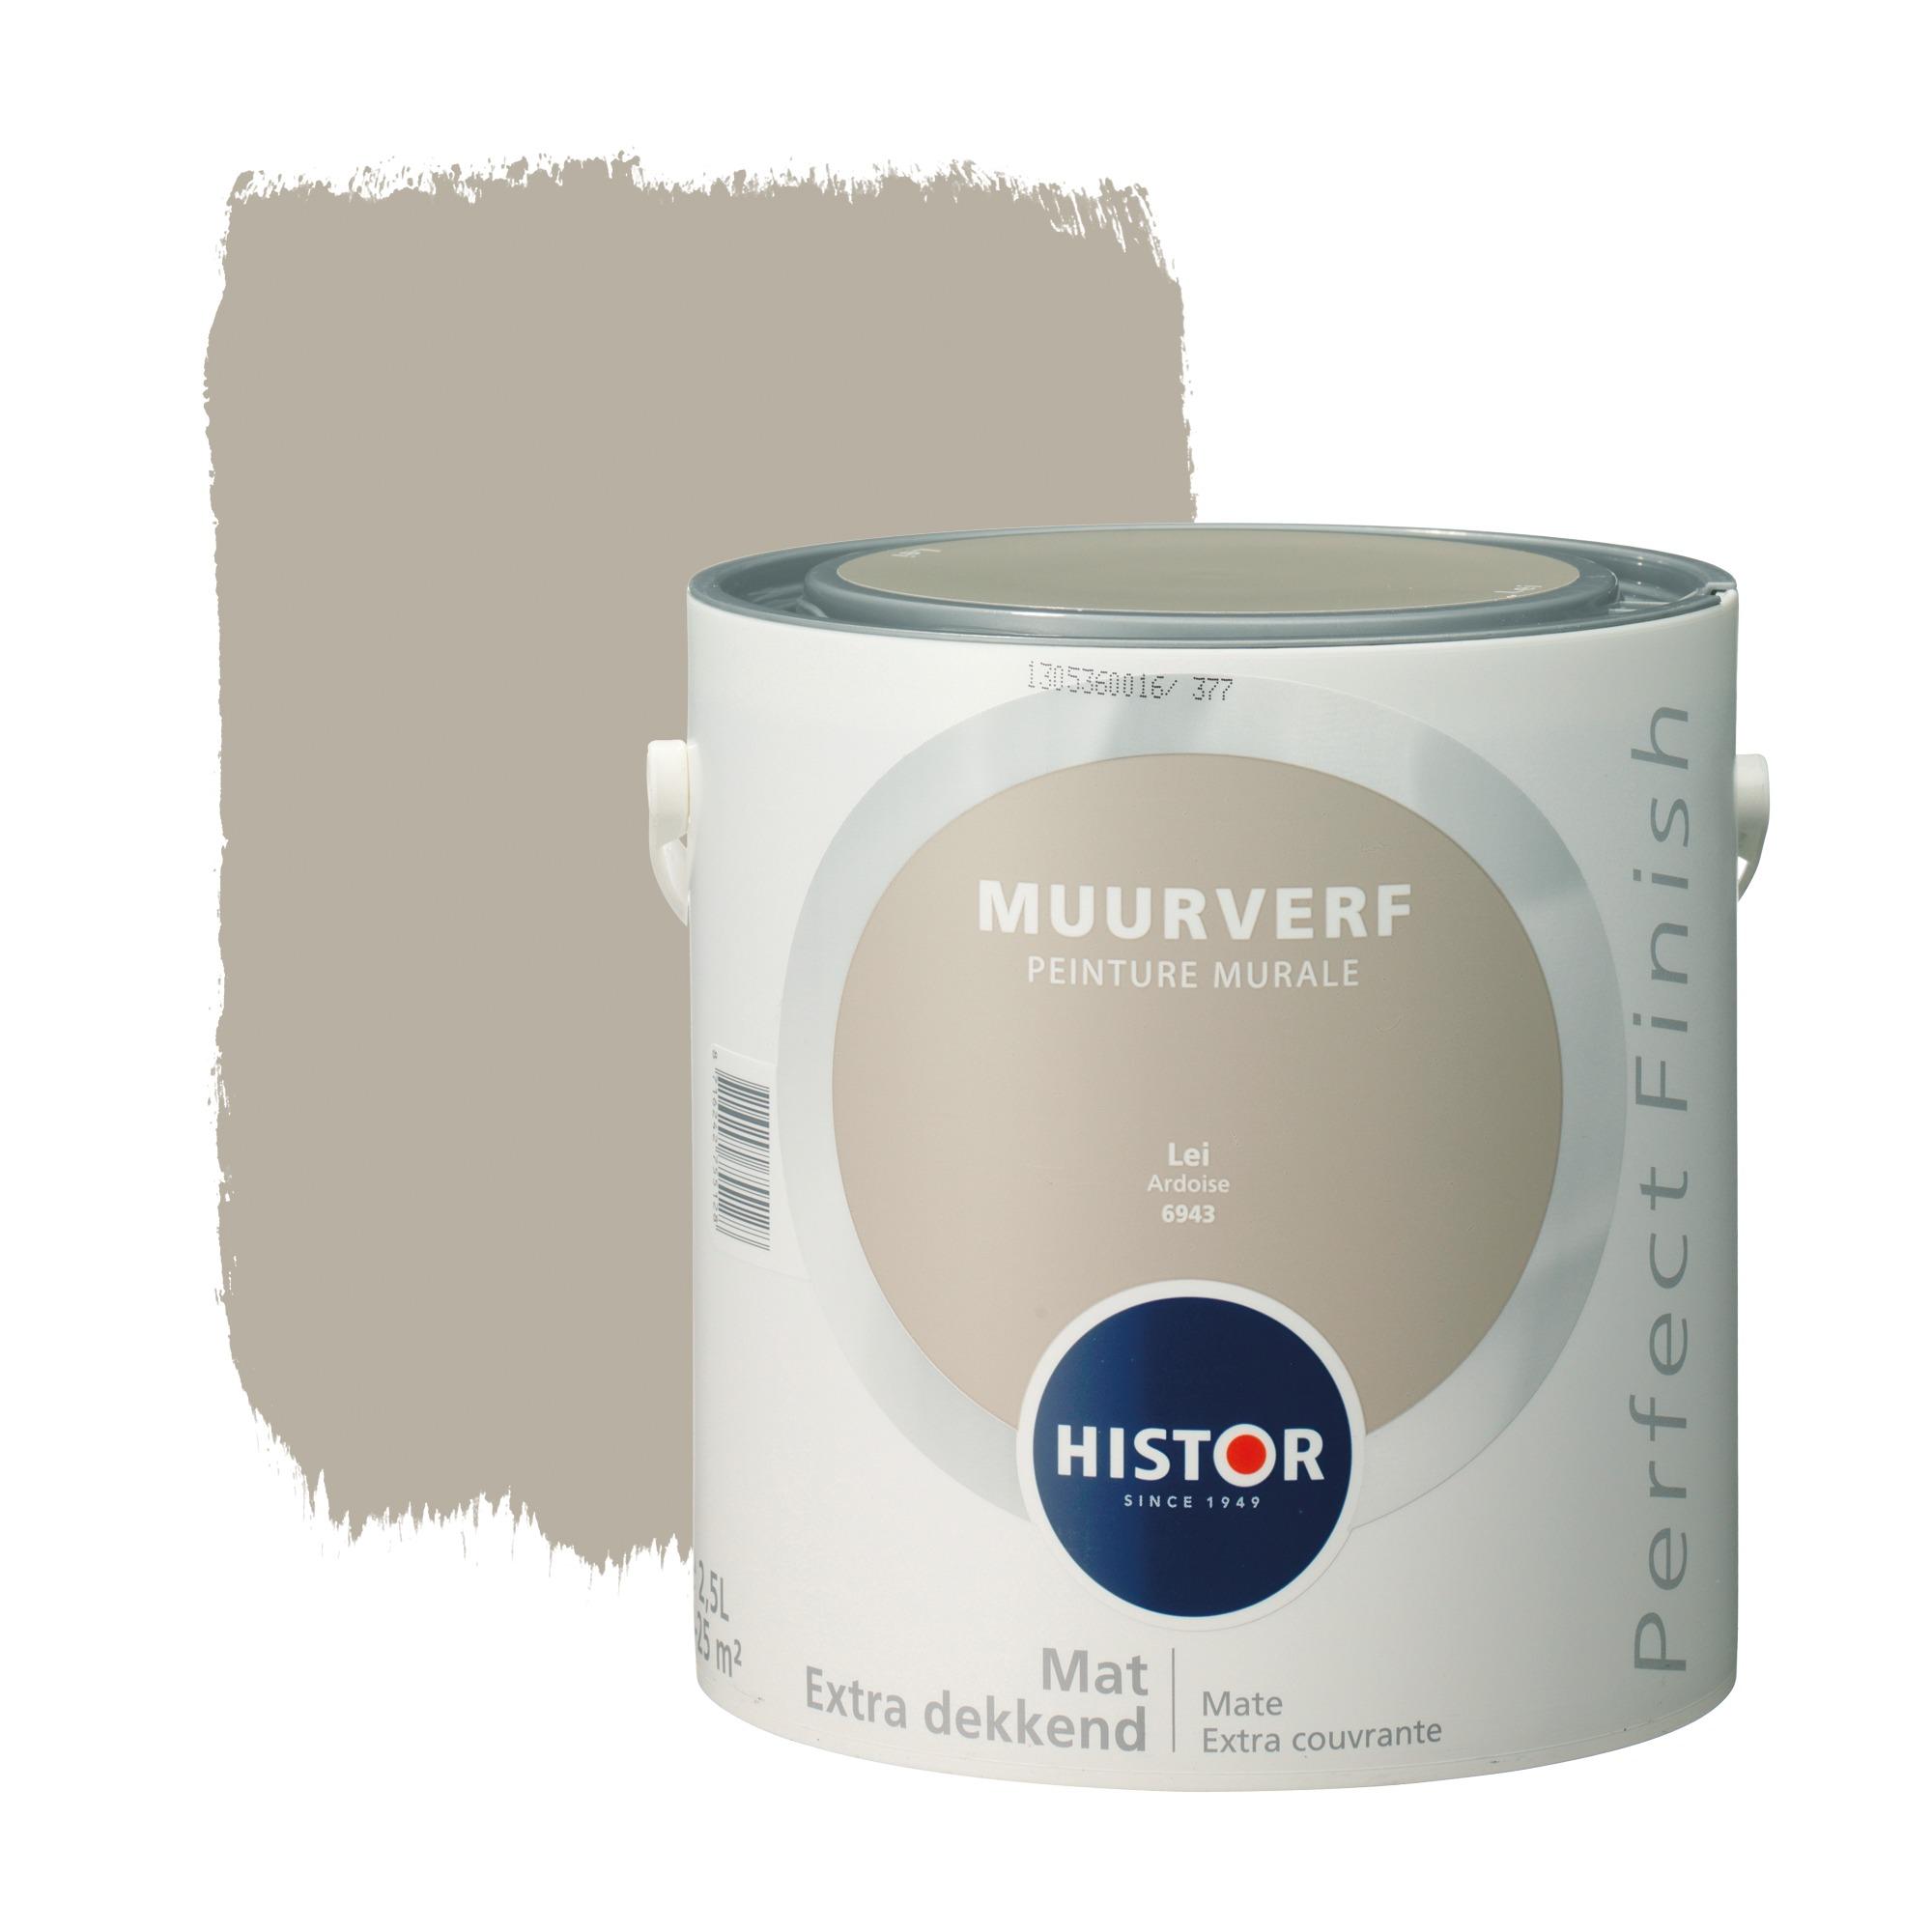 Histor perfect finish muurverf mat lei 6943 2,5 l